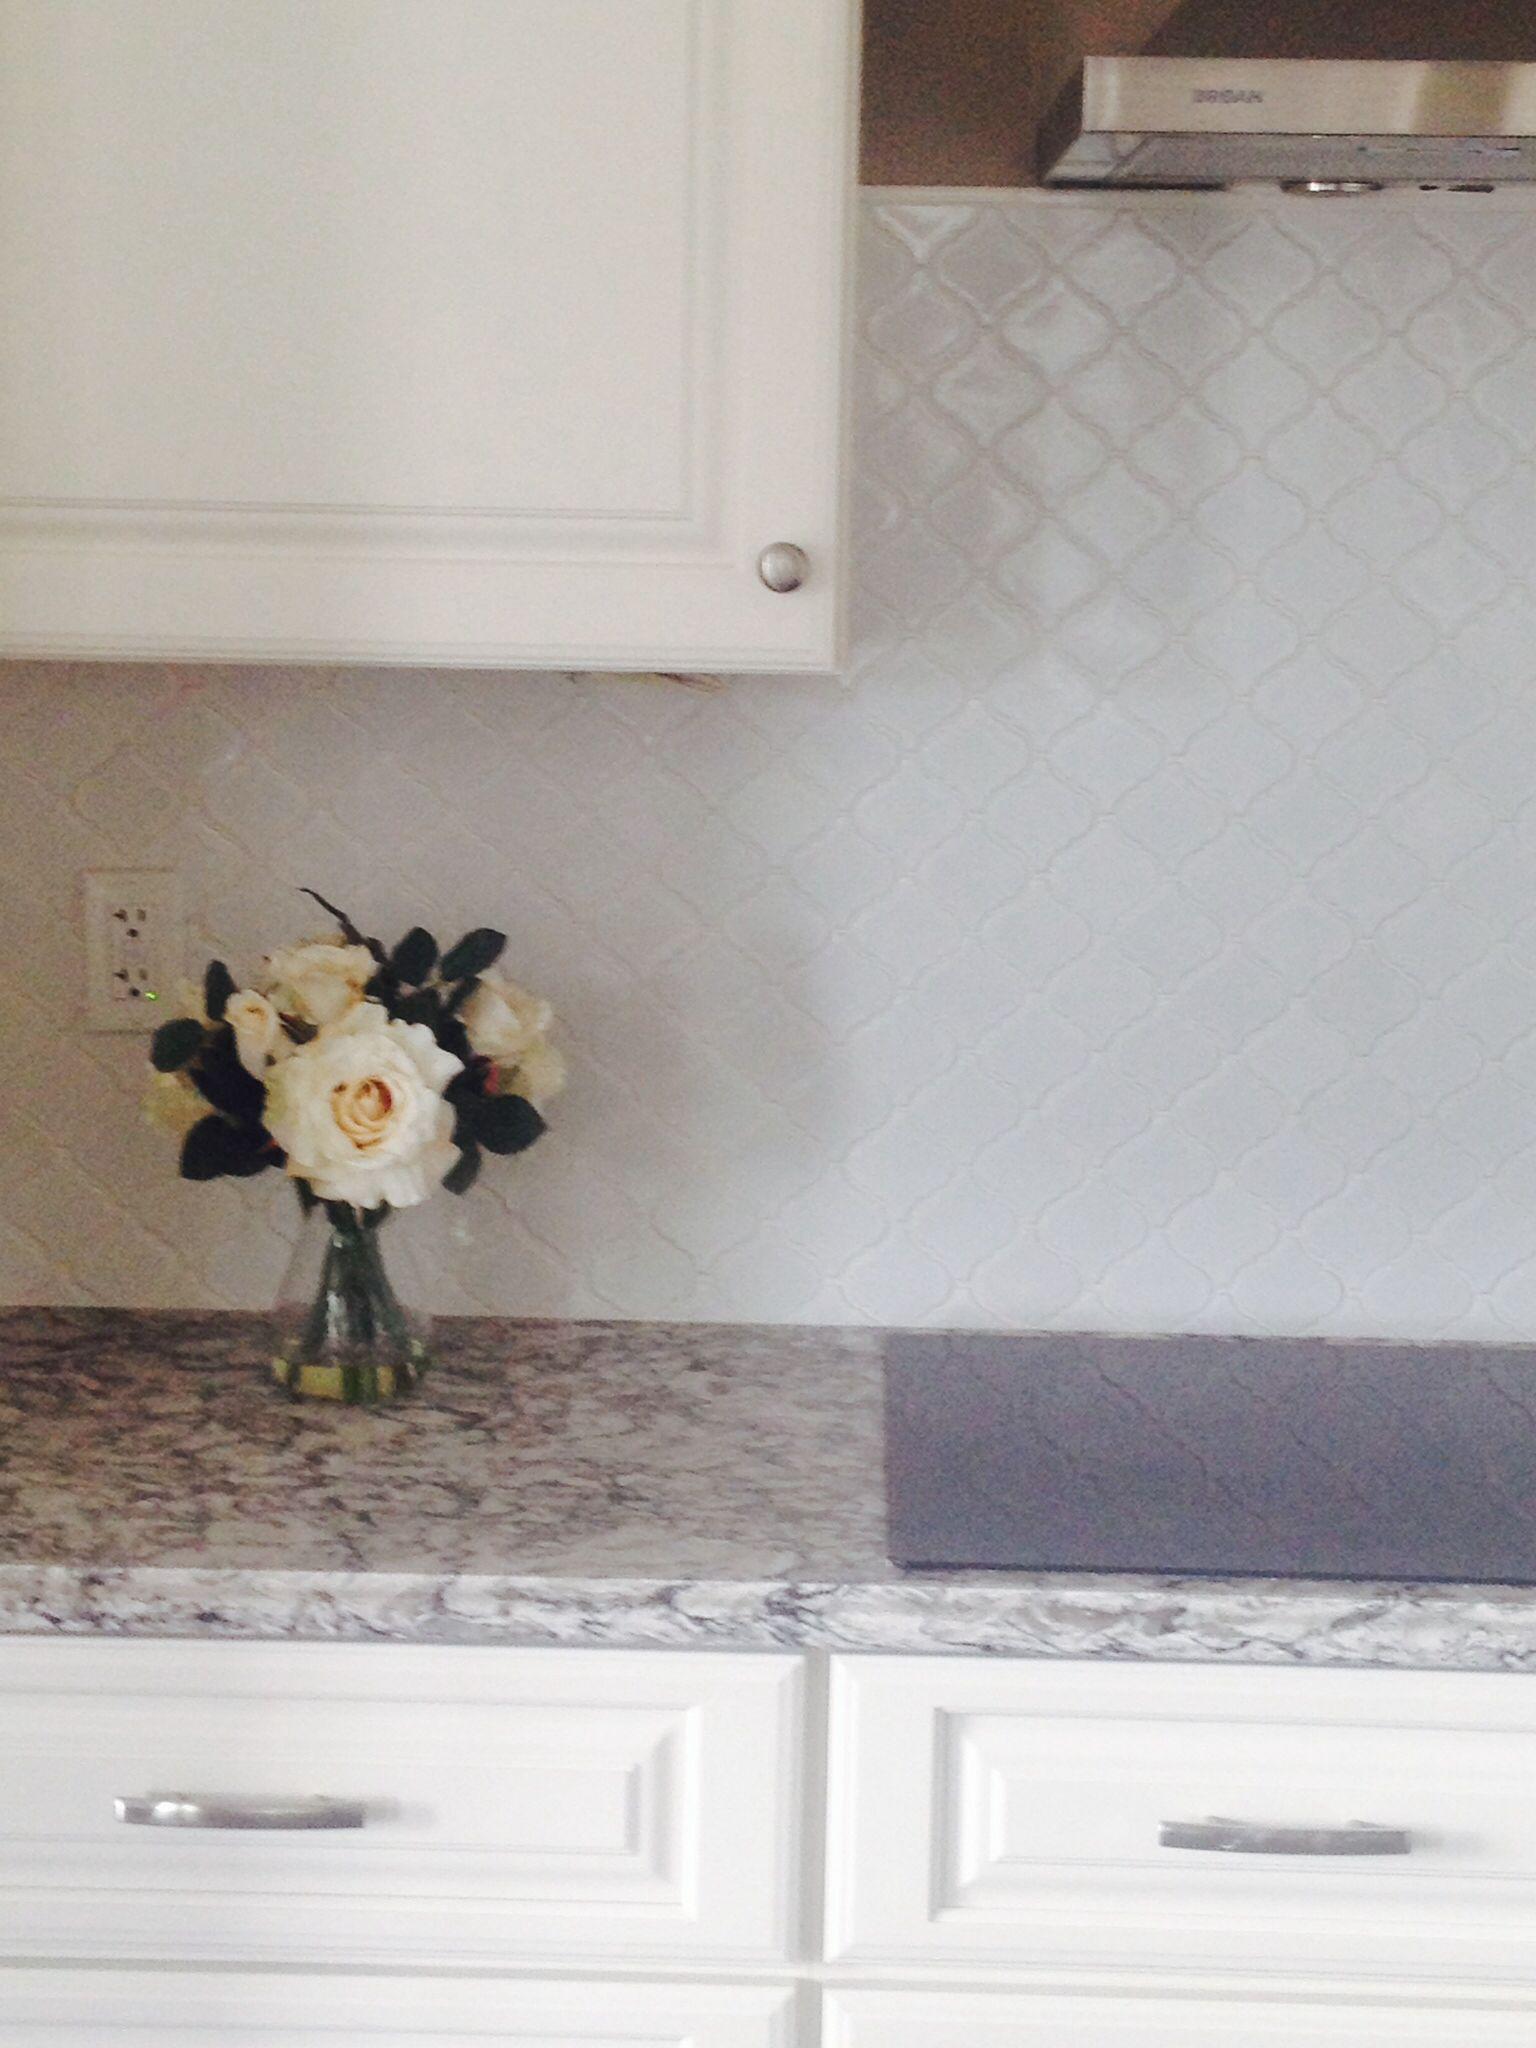 White Arabesque Lantern Tile Backsplash Kitchen Tiles Backsplash